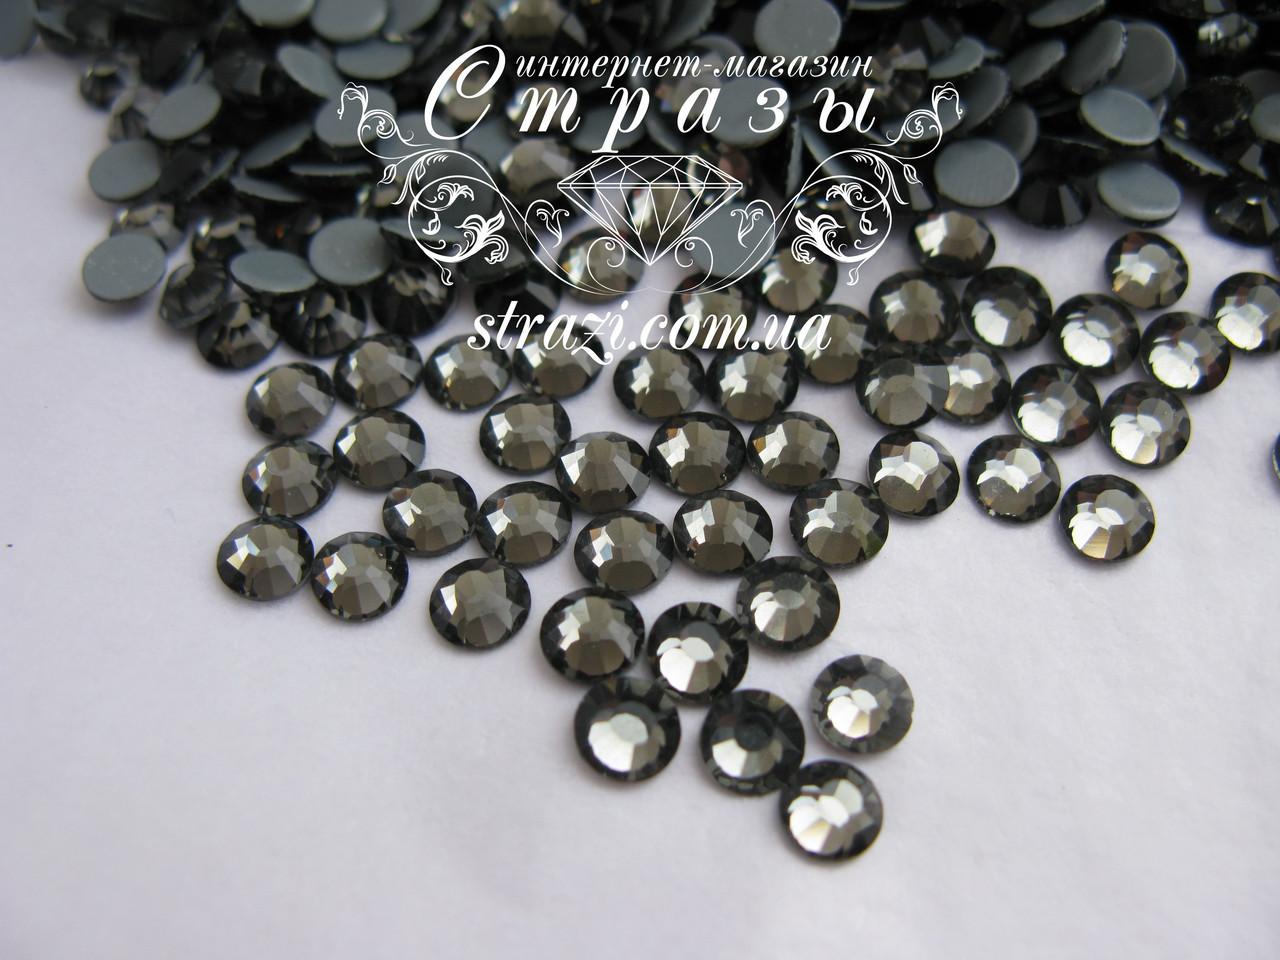 Термо стразы Lux ss20 Black Diamond (5.0mm) 1440шт